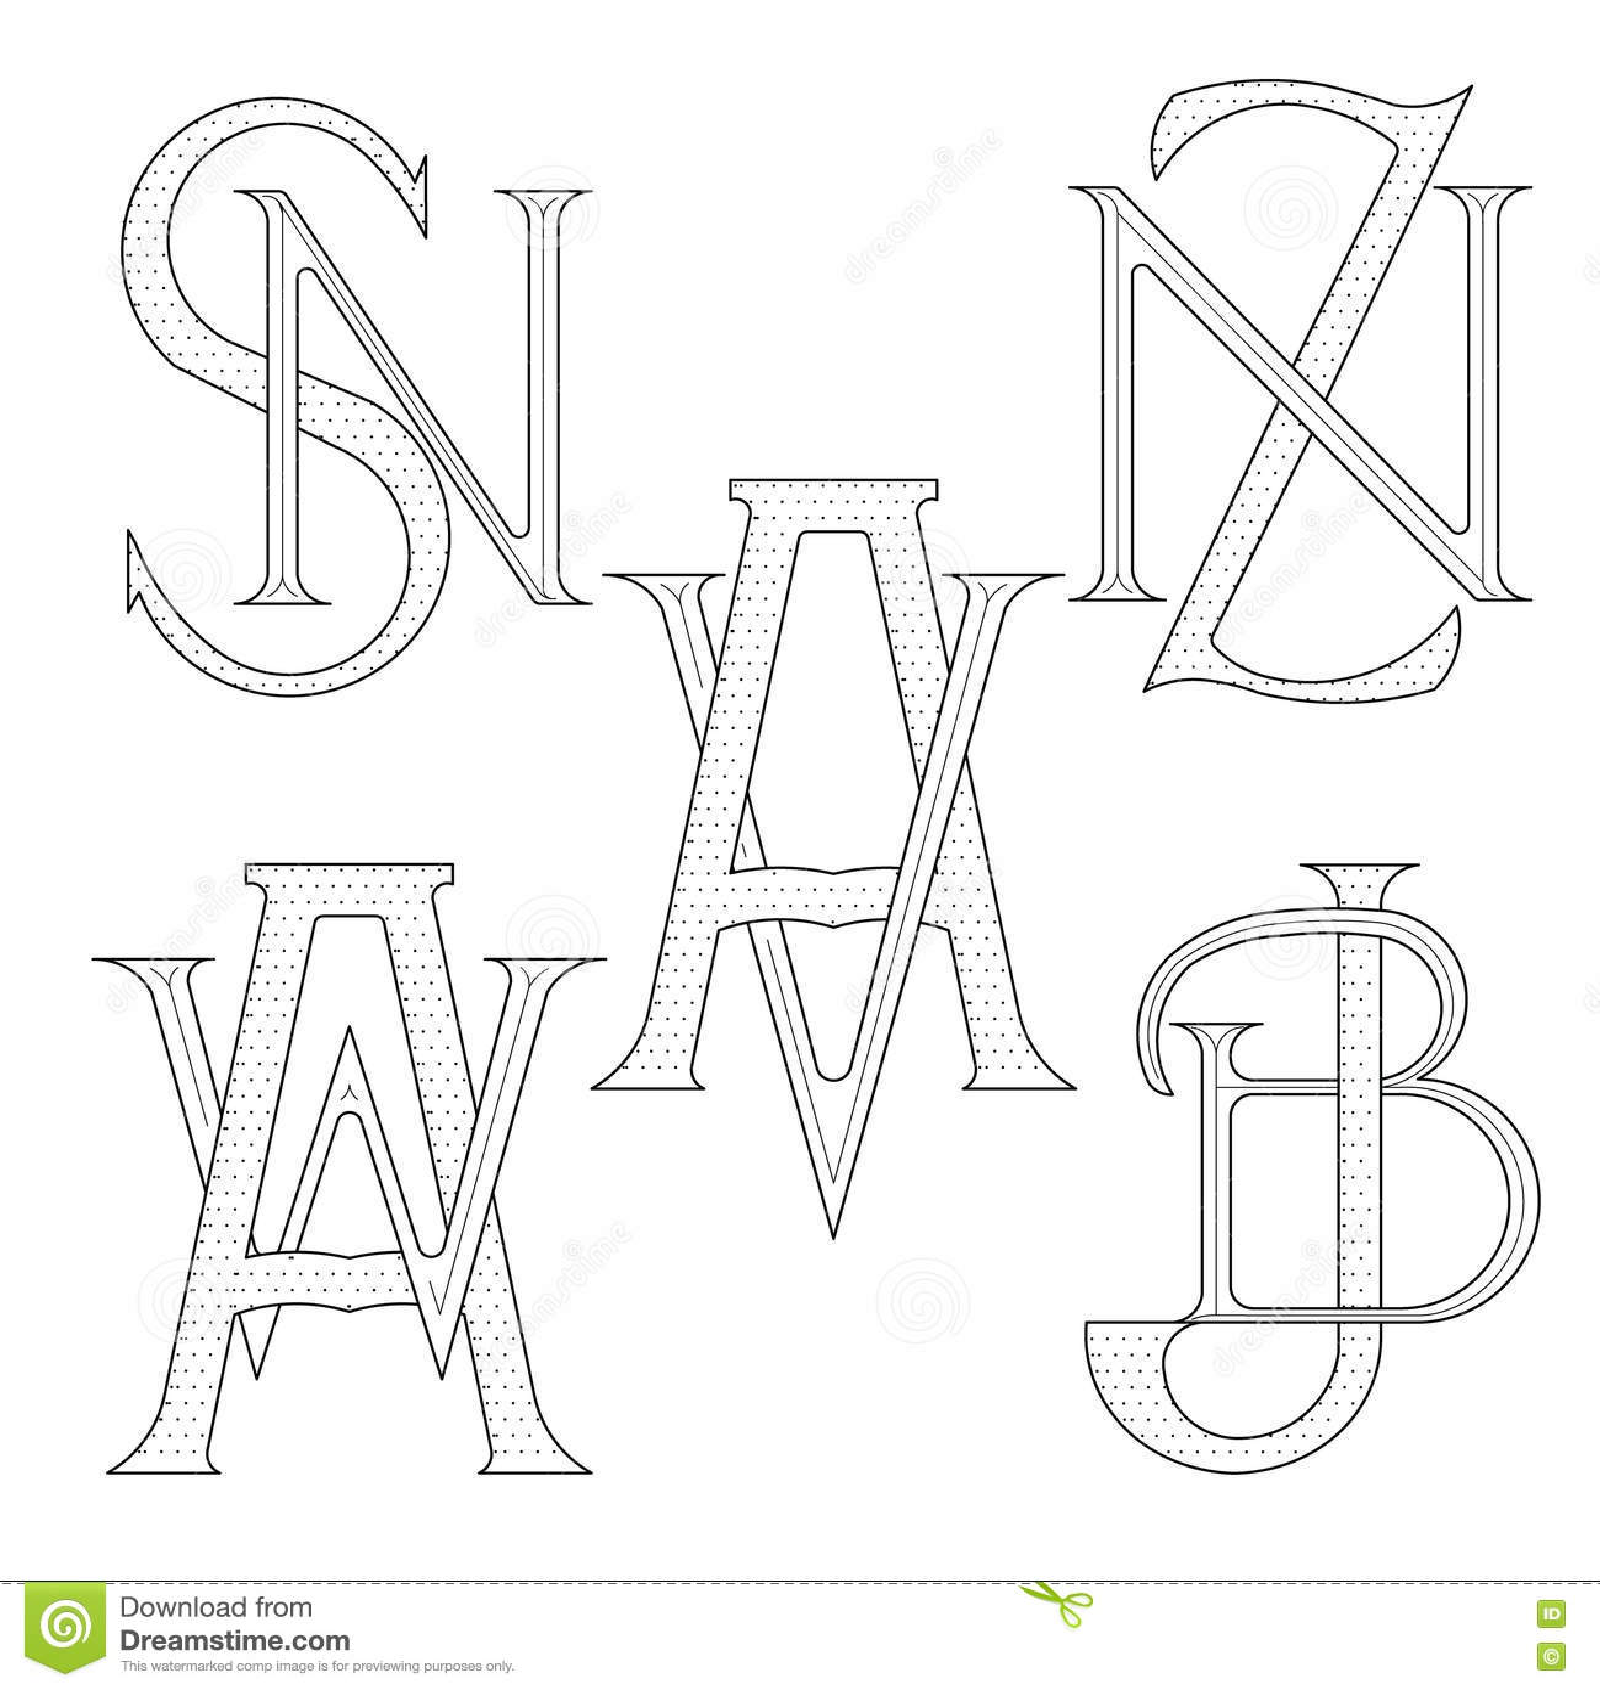 Monogram bokstäver gratis